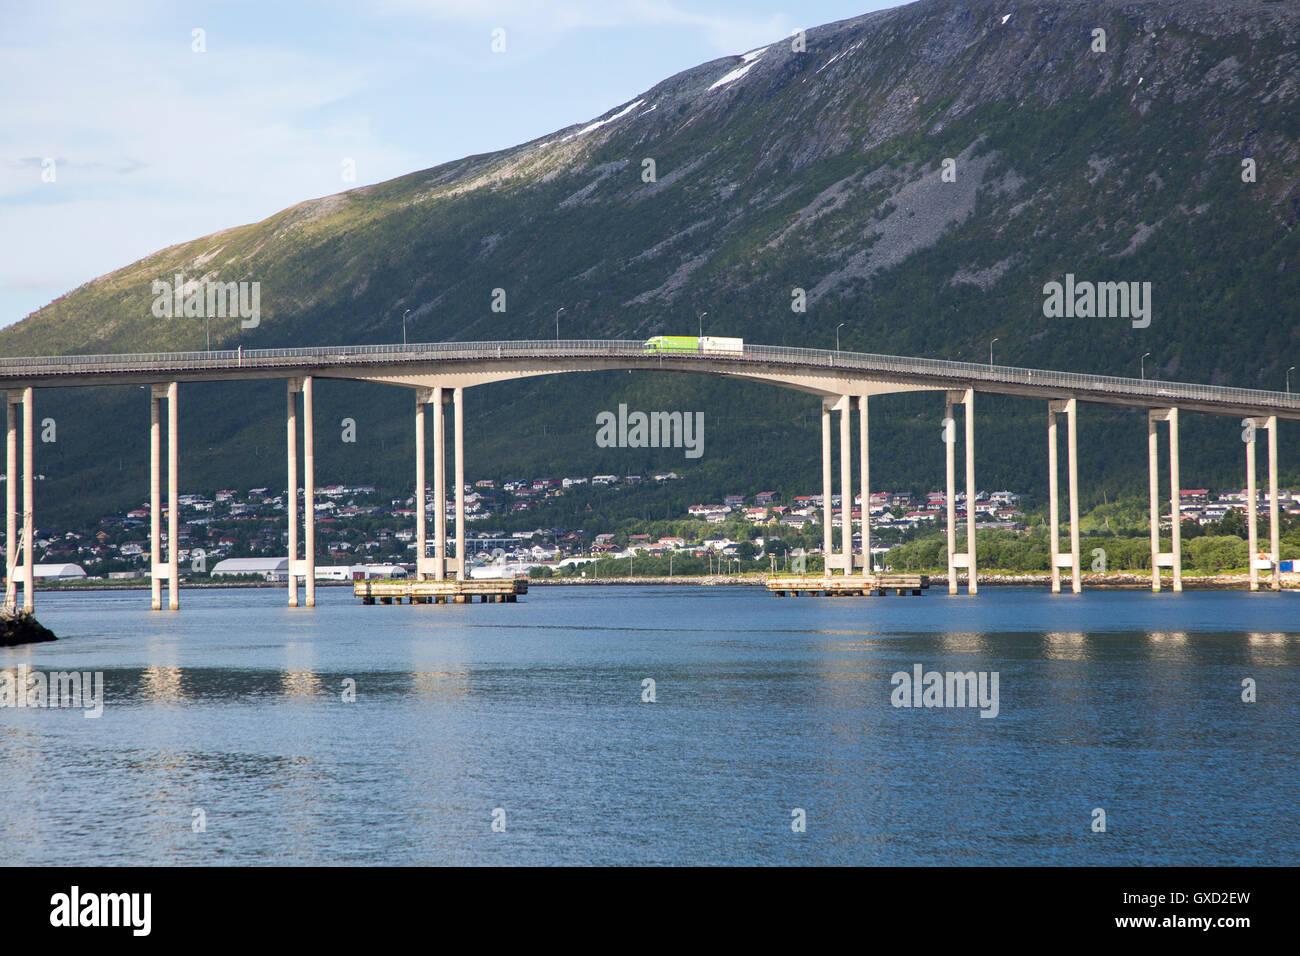 Tromso Bridge, cantilever road bridge in the city of Tromso, Norway, - Stock Image